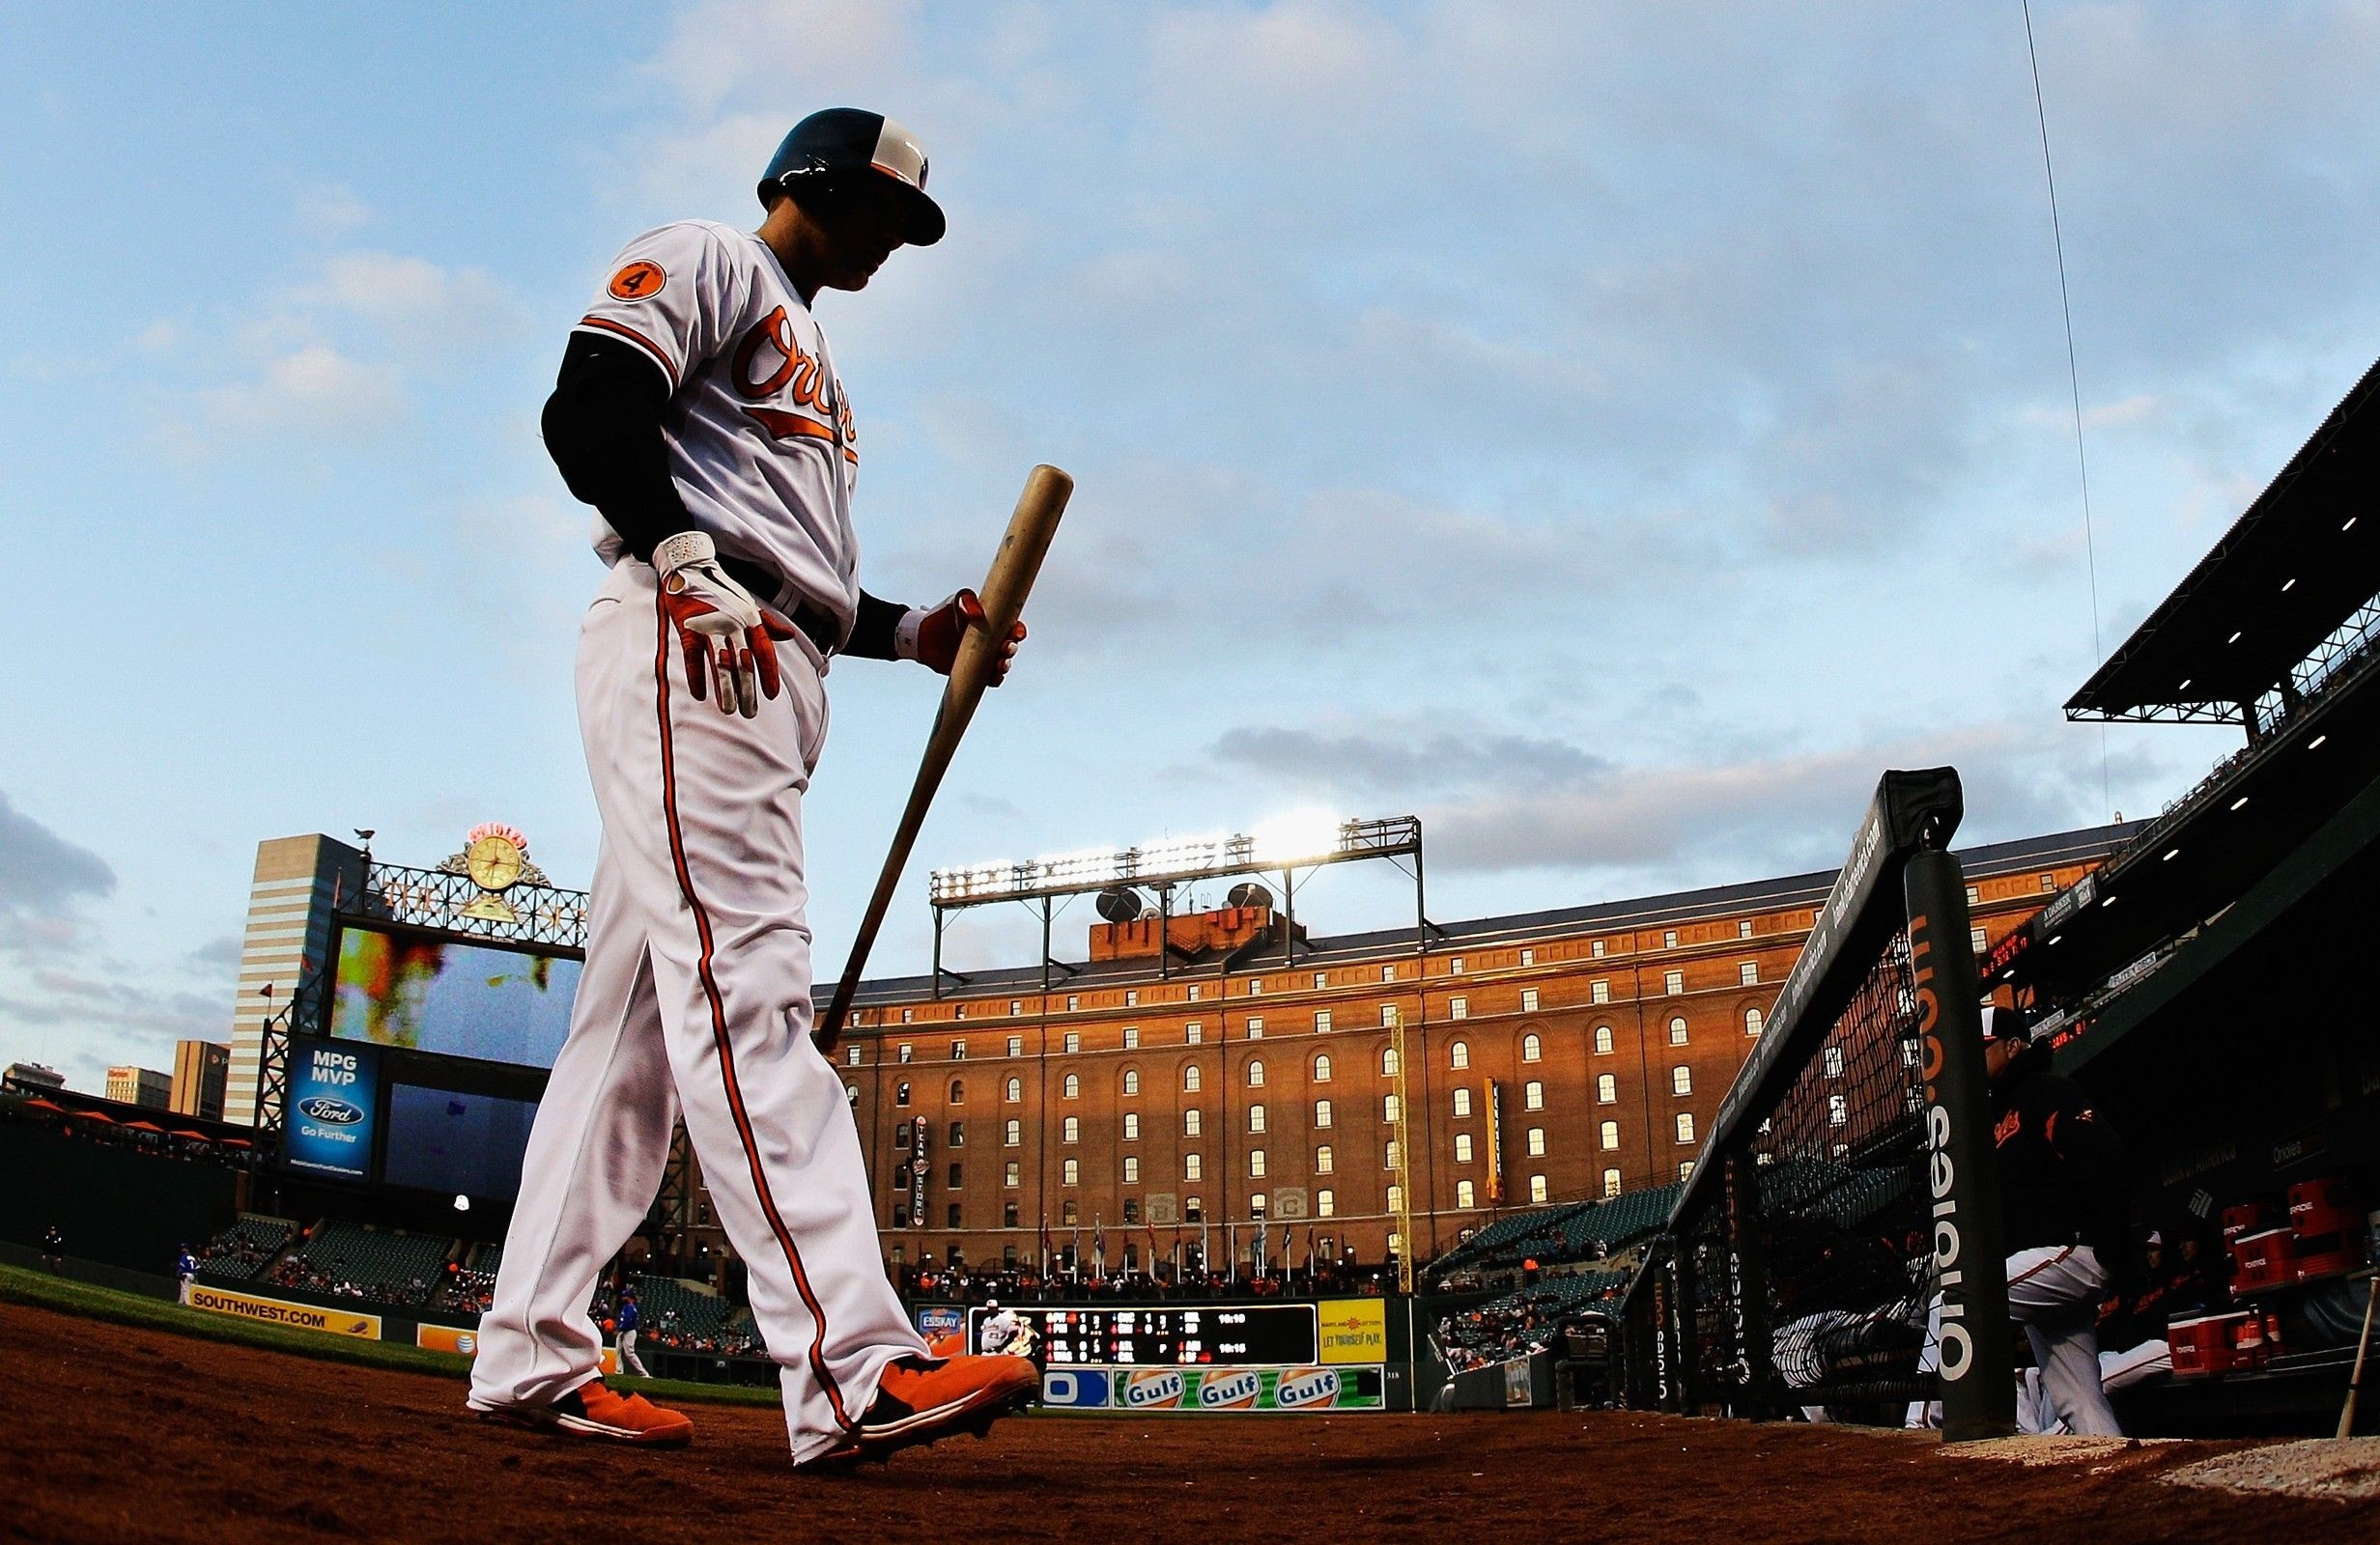 Baltimore Orioles Desktop Wallpaper